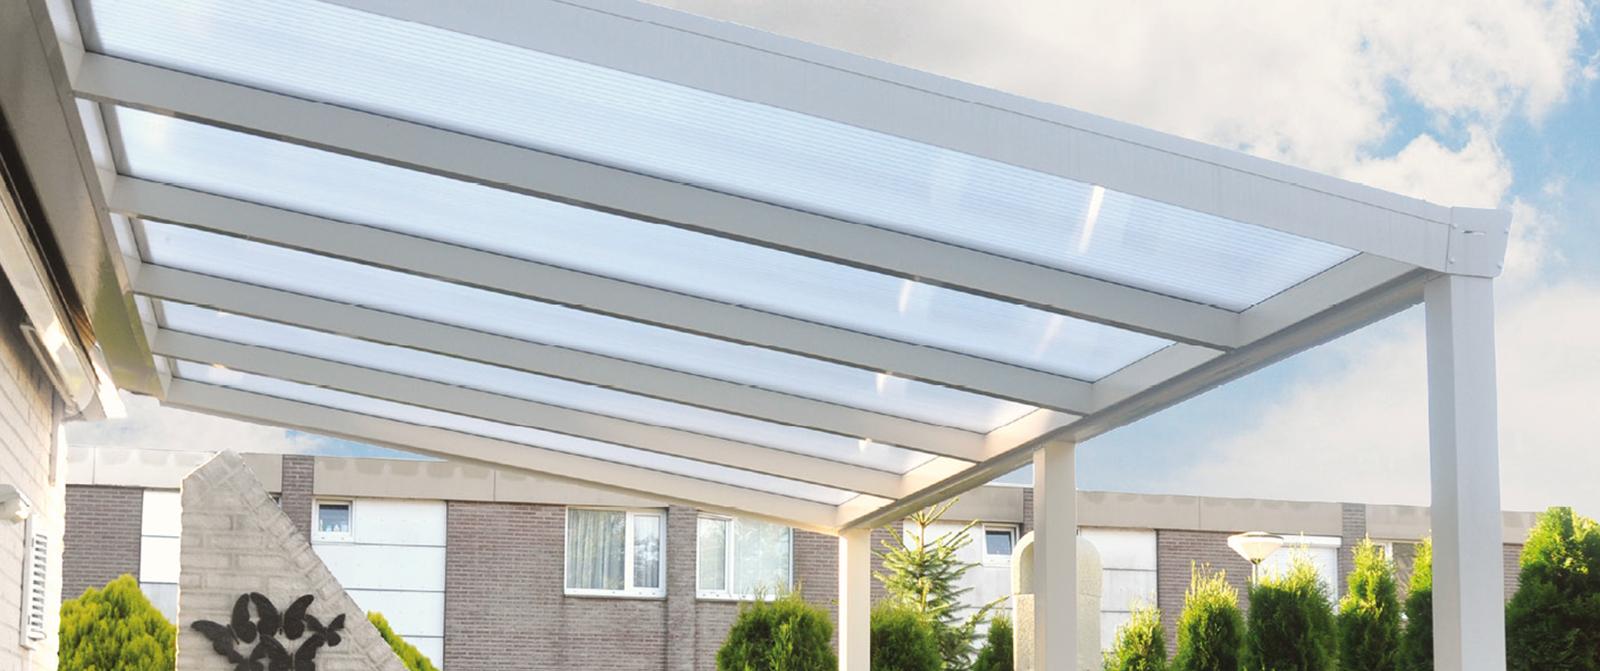 Terrassendach weiß Aluminium